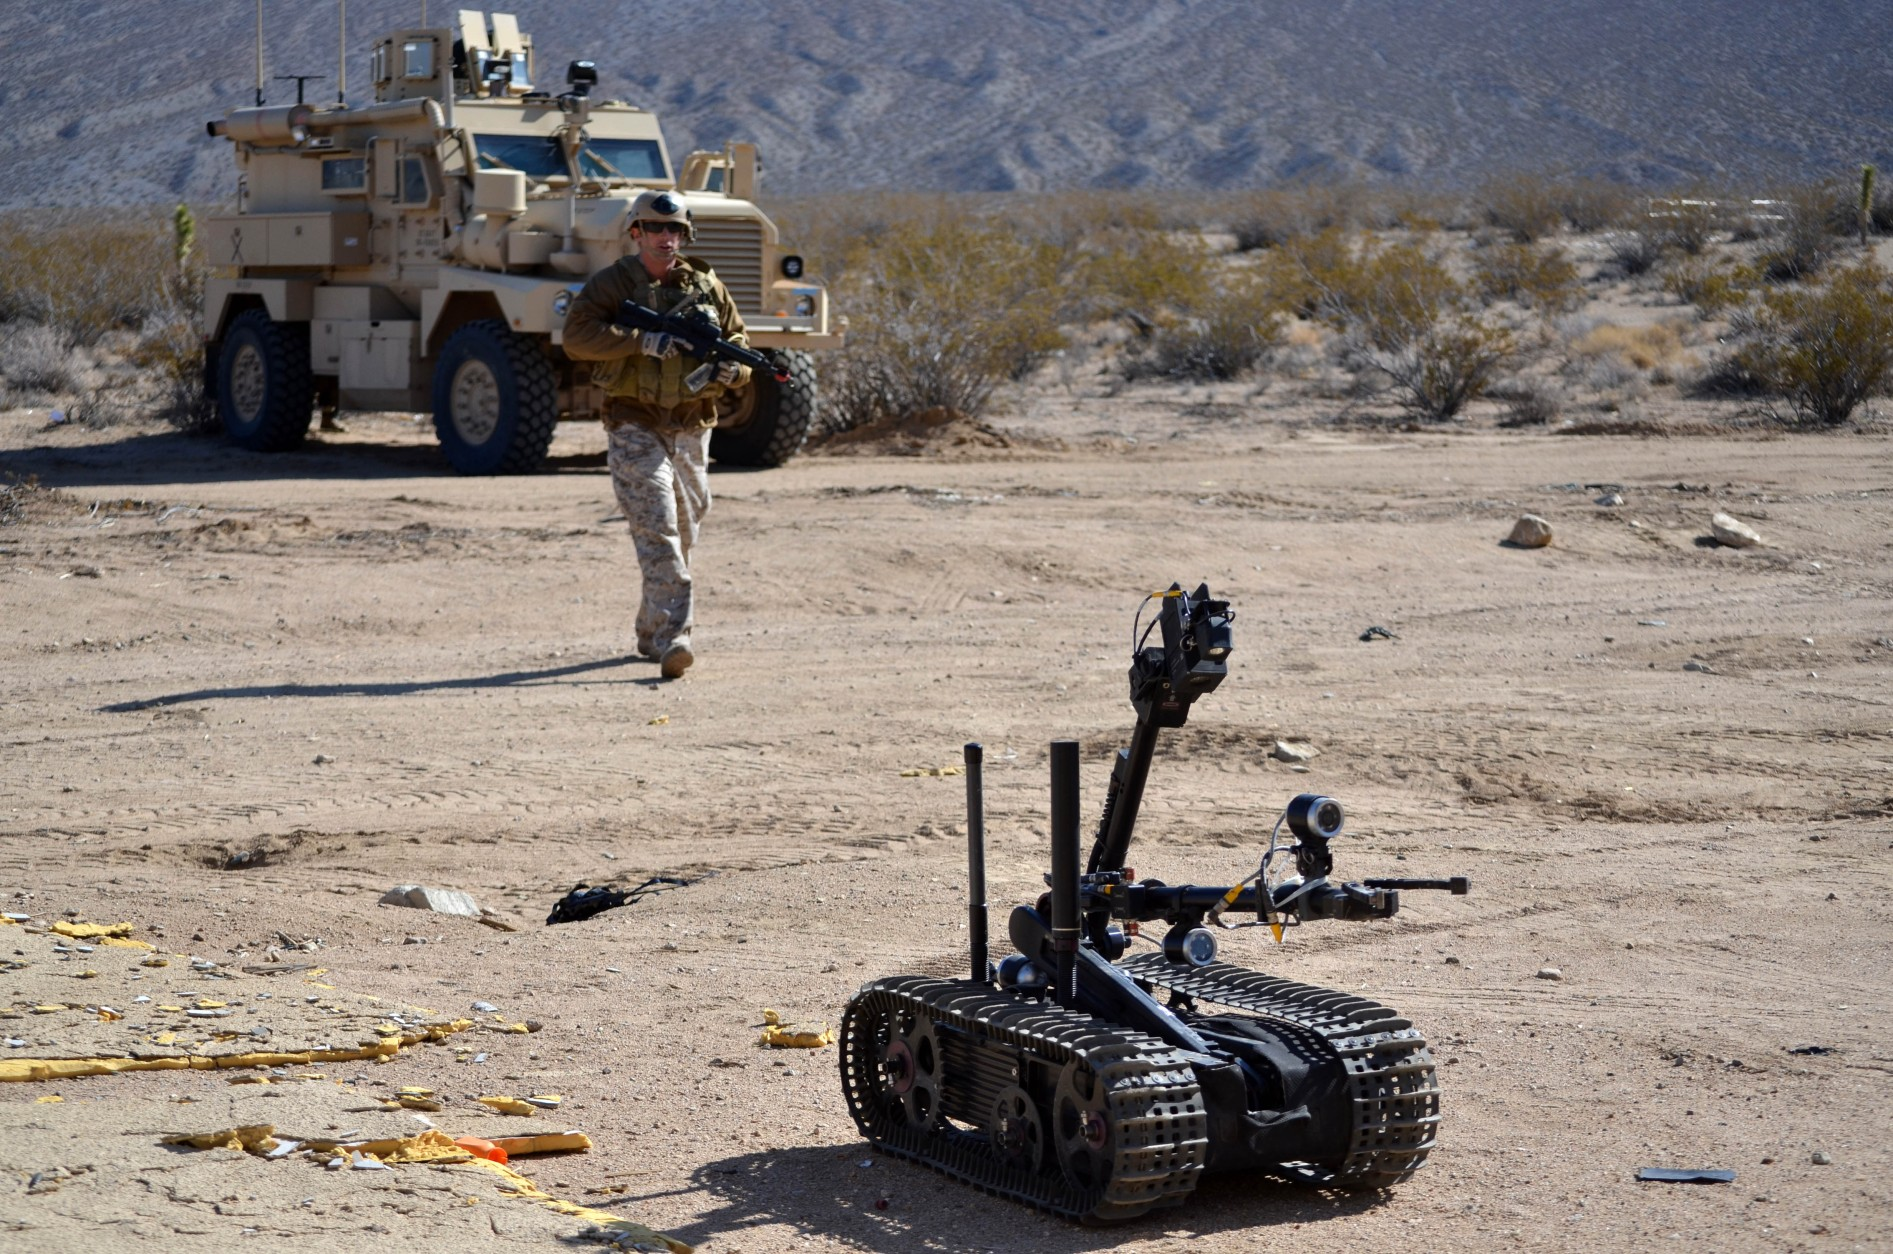 Military robots Image